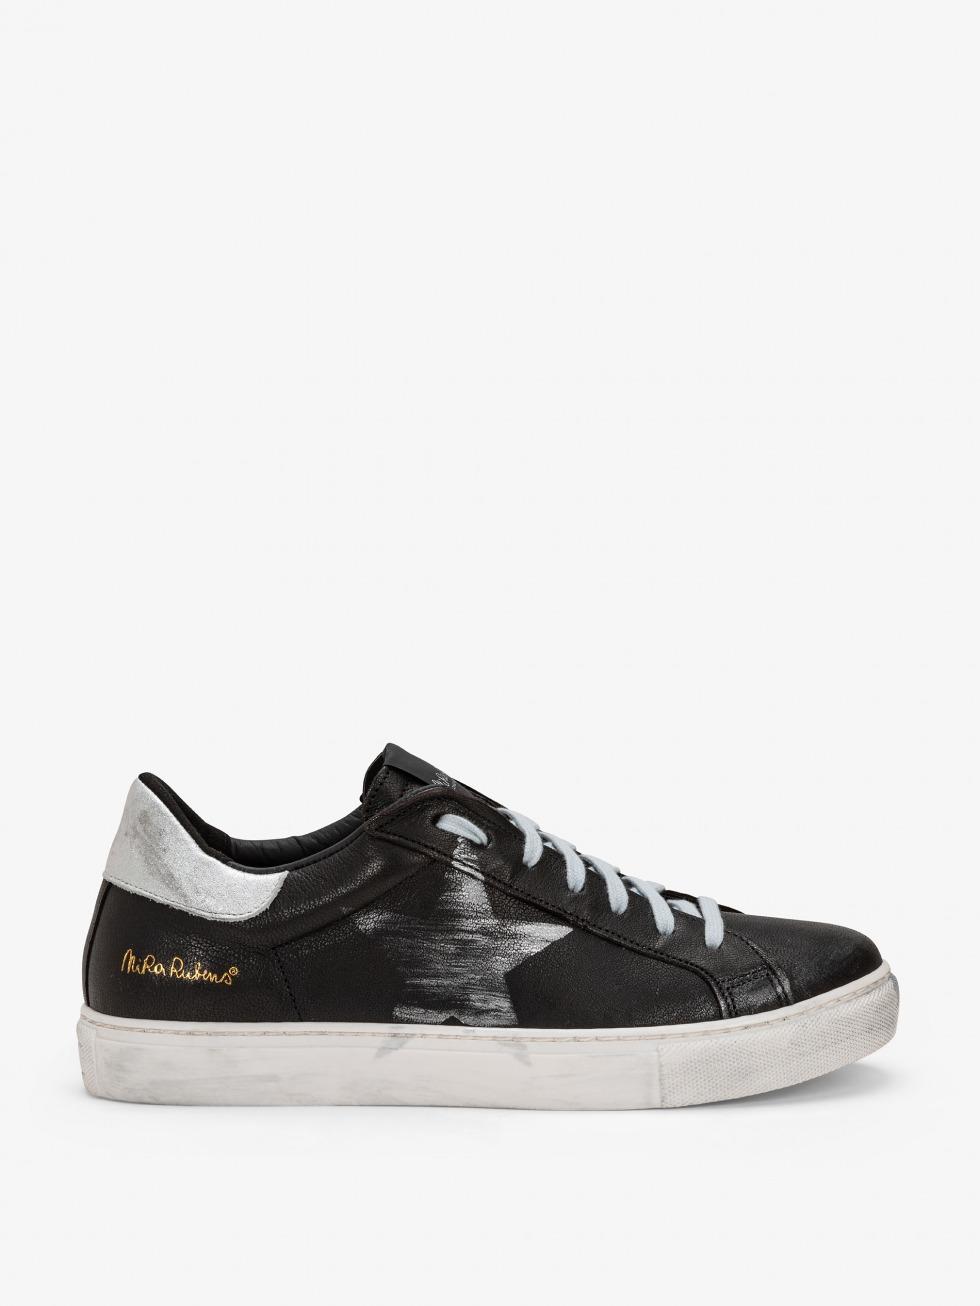 Black Ice Martini M Sneakers - Star